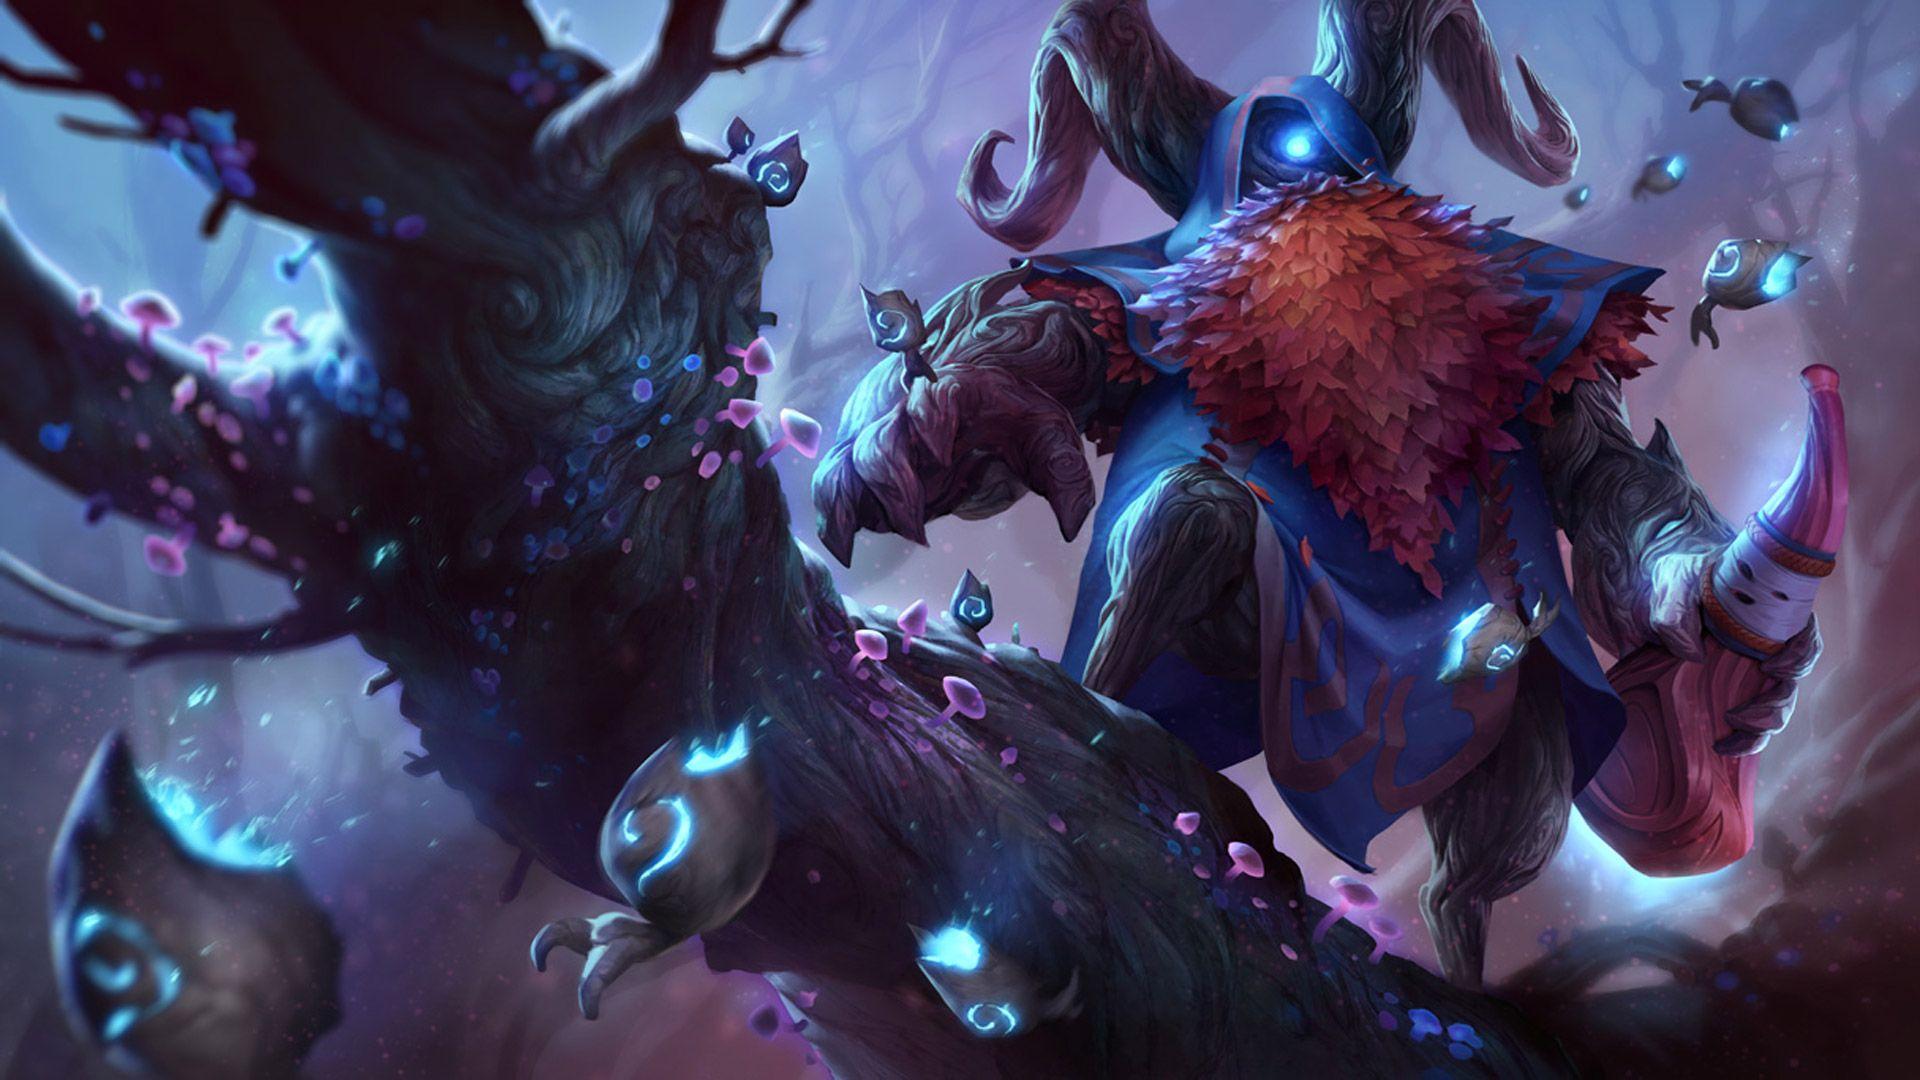 Elderwood Bard League Of Legends Wallpapers Hd Art Of Lol Bard League Of Legends League Of Legends Characters